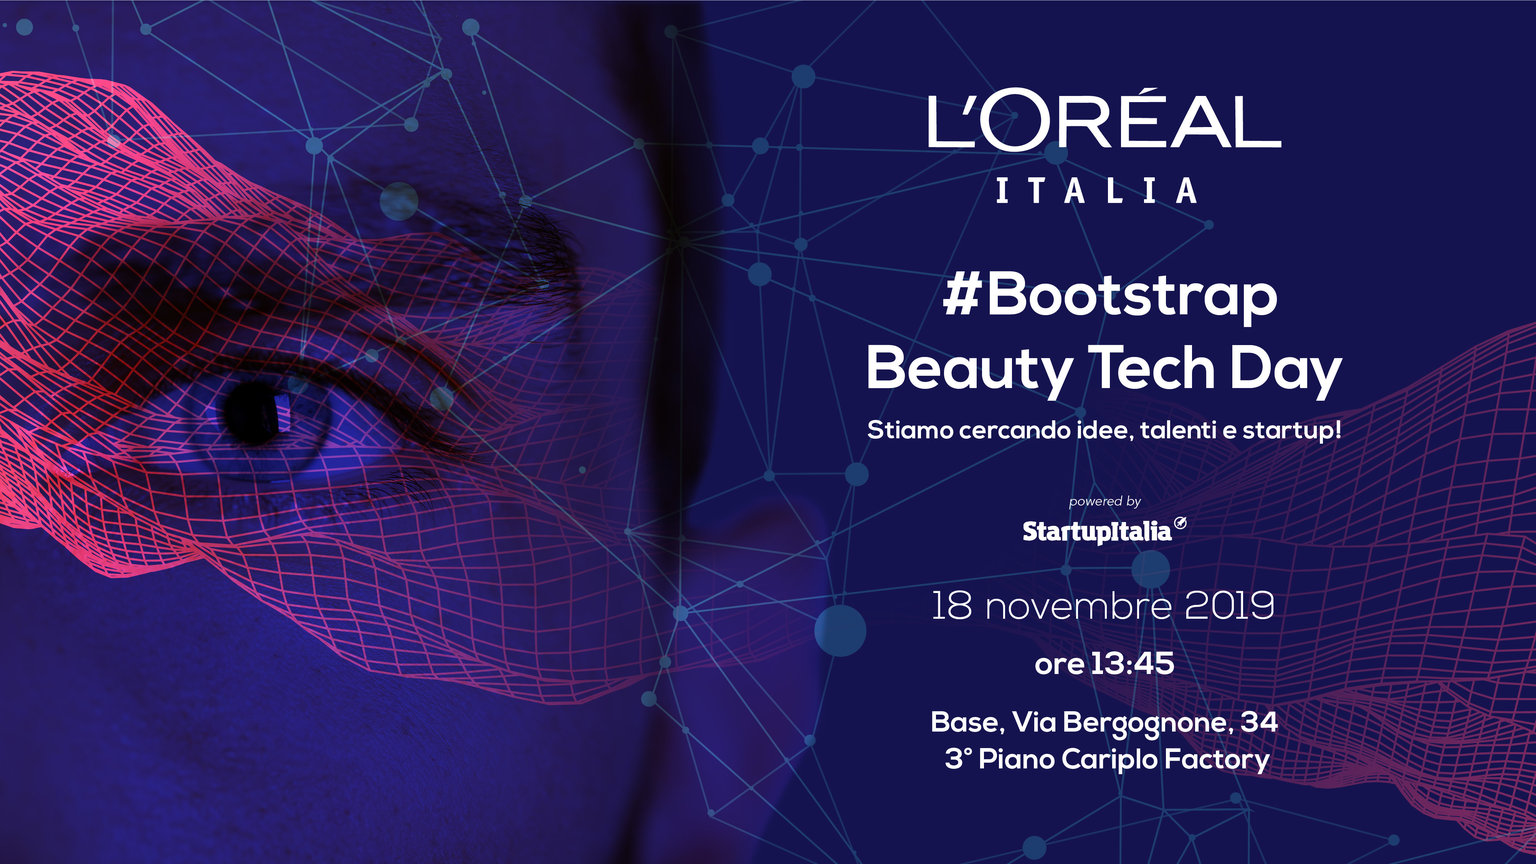 Talenti, startup e mentor a confronto. Torna #Bootstrap a L'Oréal Beauty Tech Day